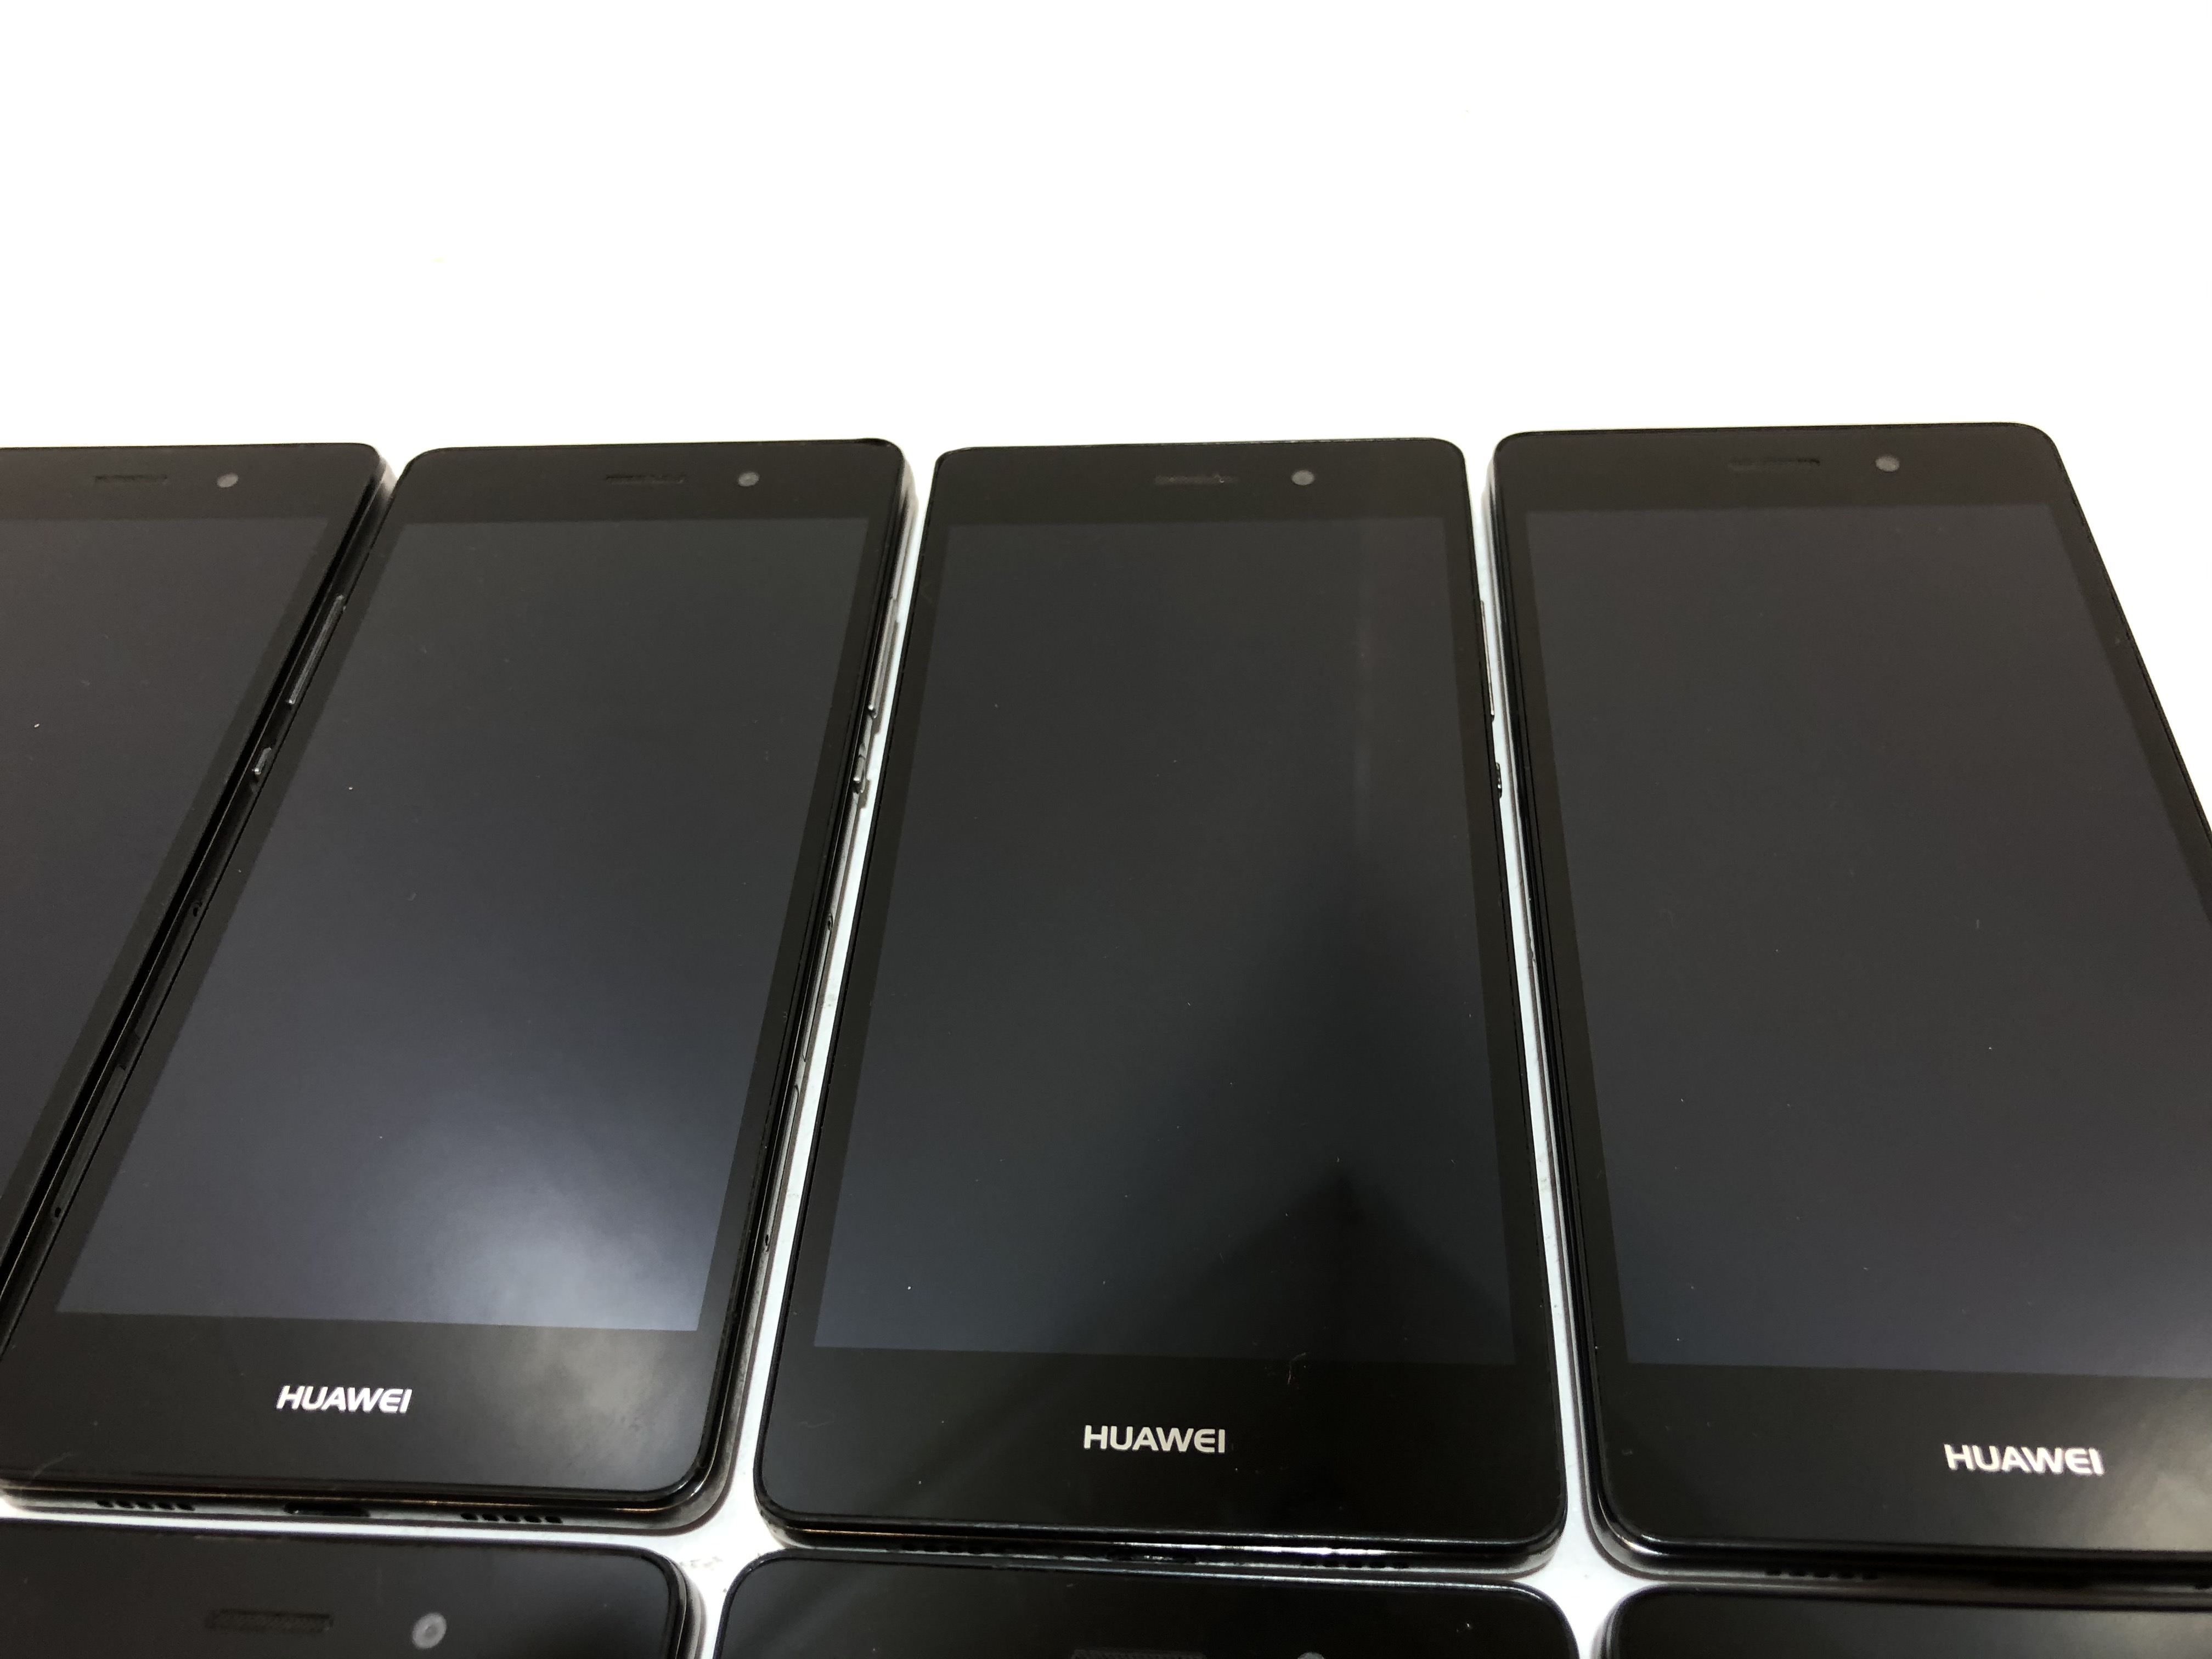 10 x Huawei P8 Lite No 3